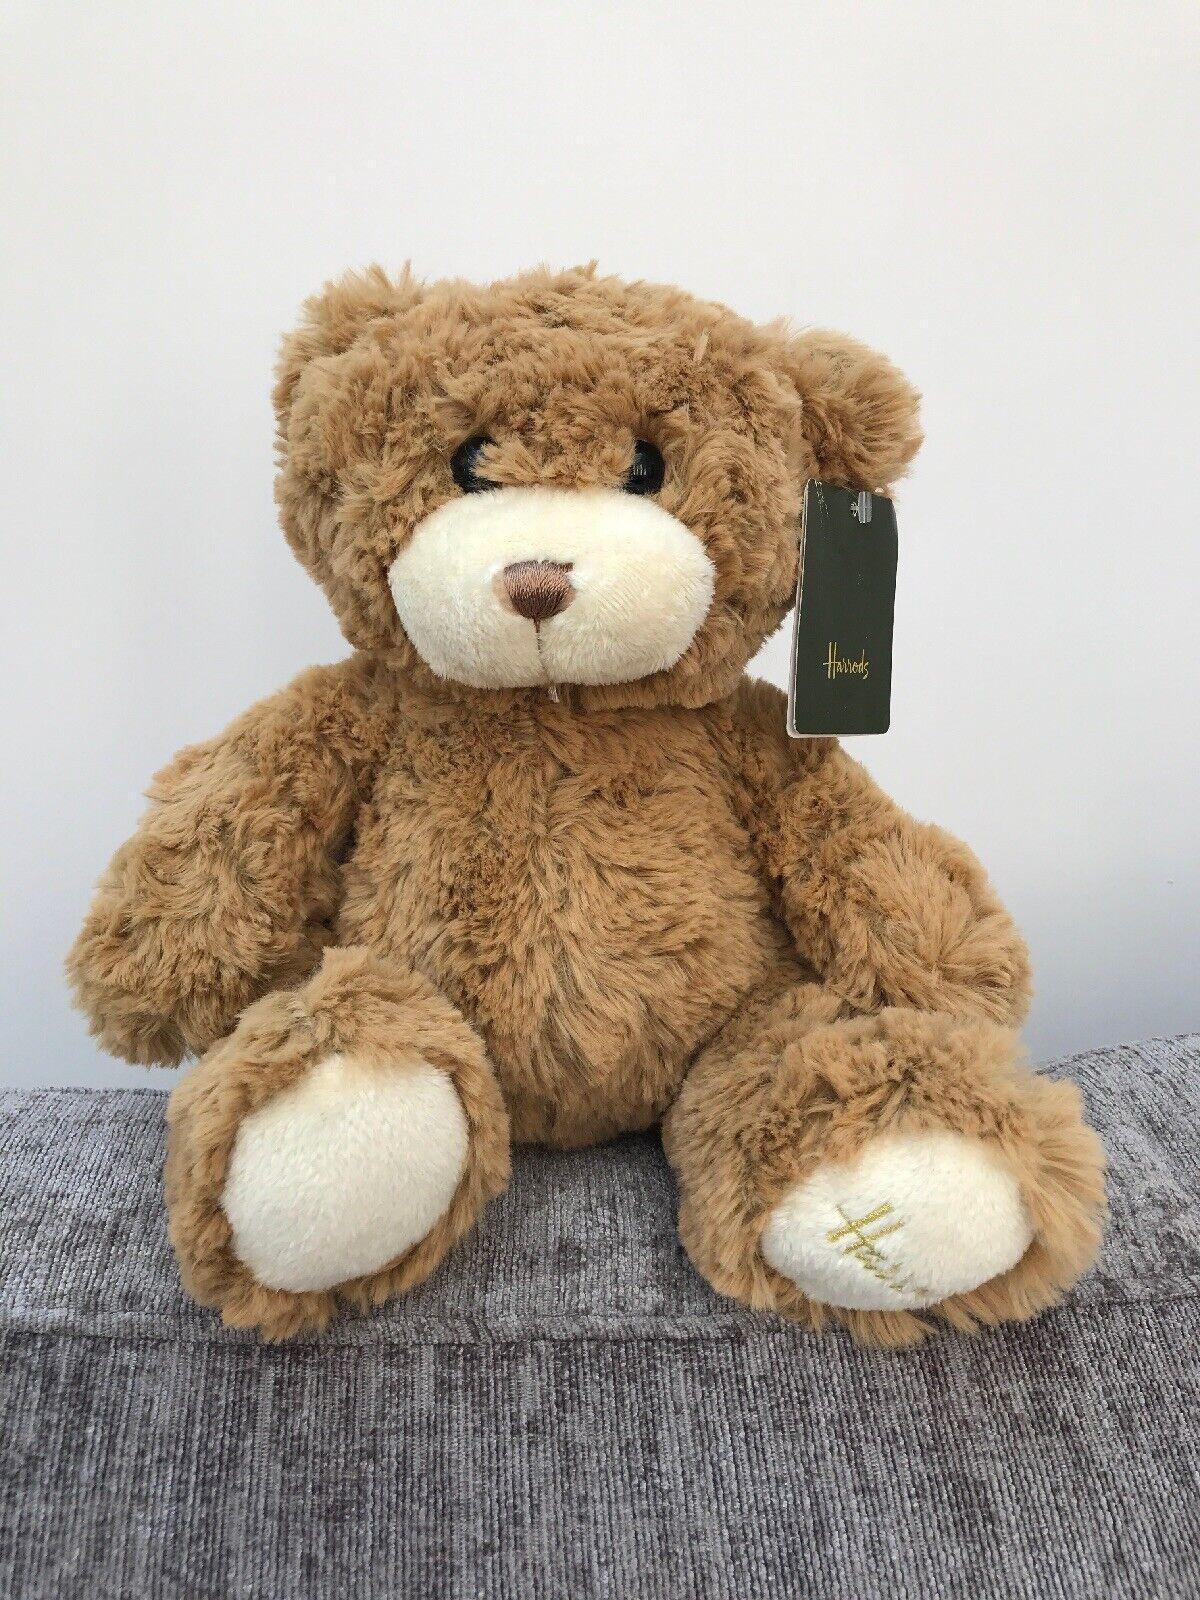 Harrods braun Teddy Bear Soft Toy And Tag Kingsley plush plush plush 10  5cac59